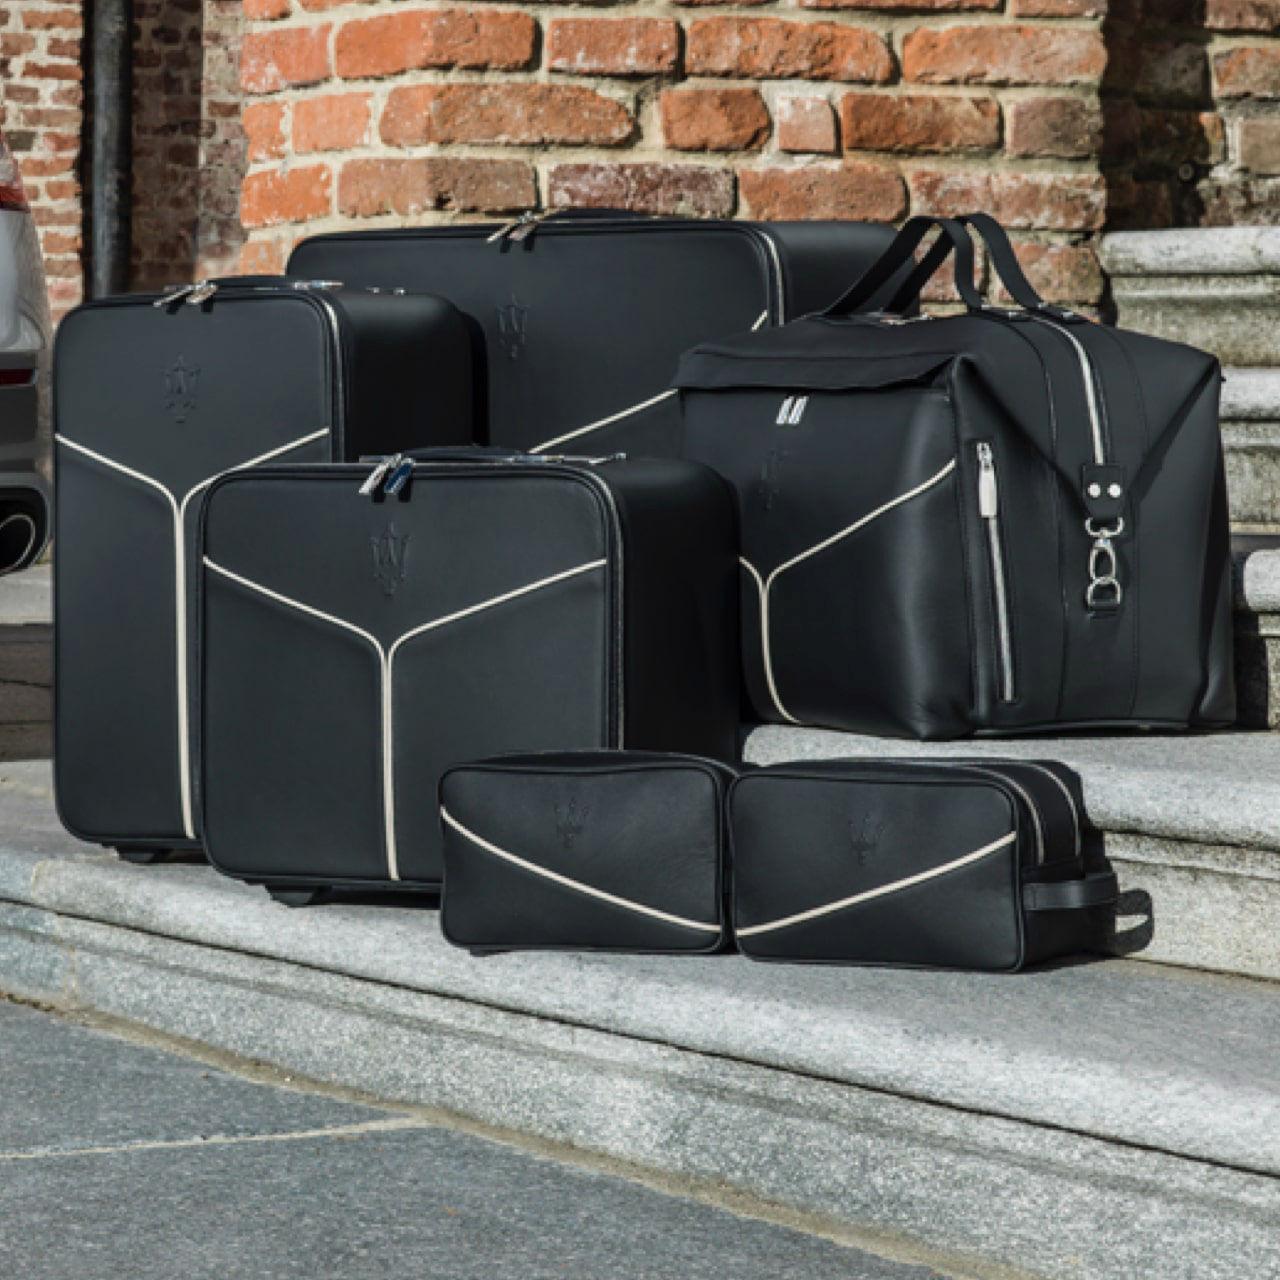 Maserati accessories and customisation -  Suitcases and bags Maserati Quattroporte